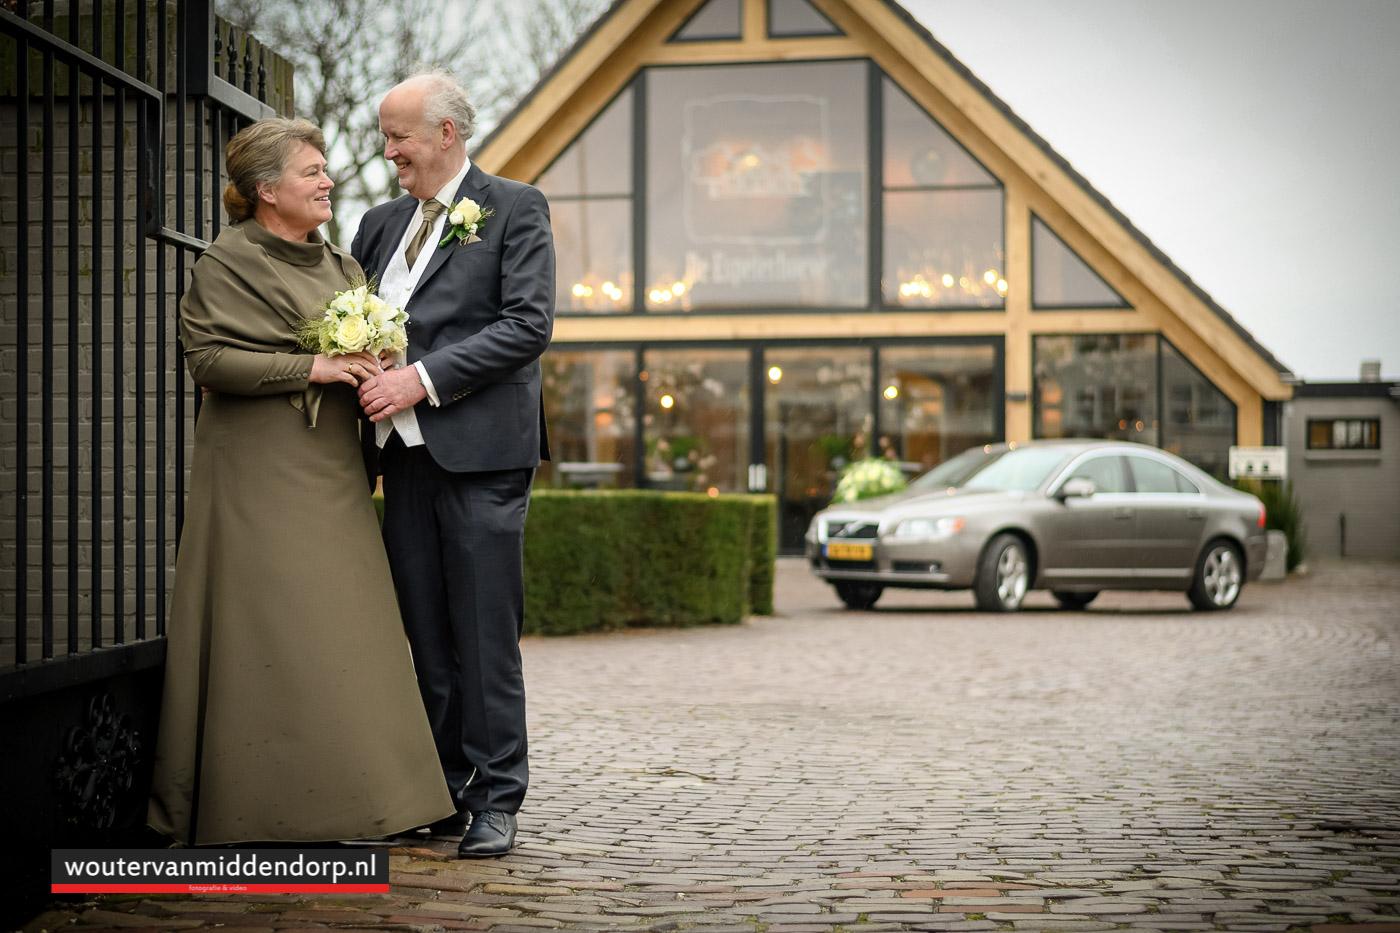 bruidsfotografie Wouter van Middendorp Uddel Elspeet Barneveld, omgeving trouwfotograaf-12